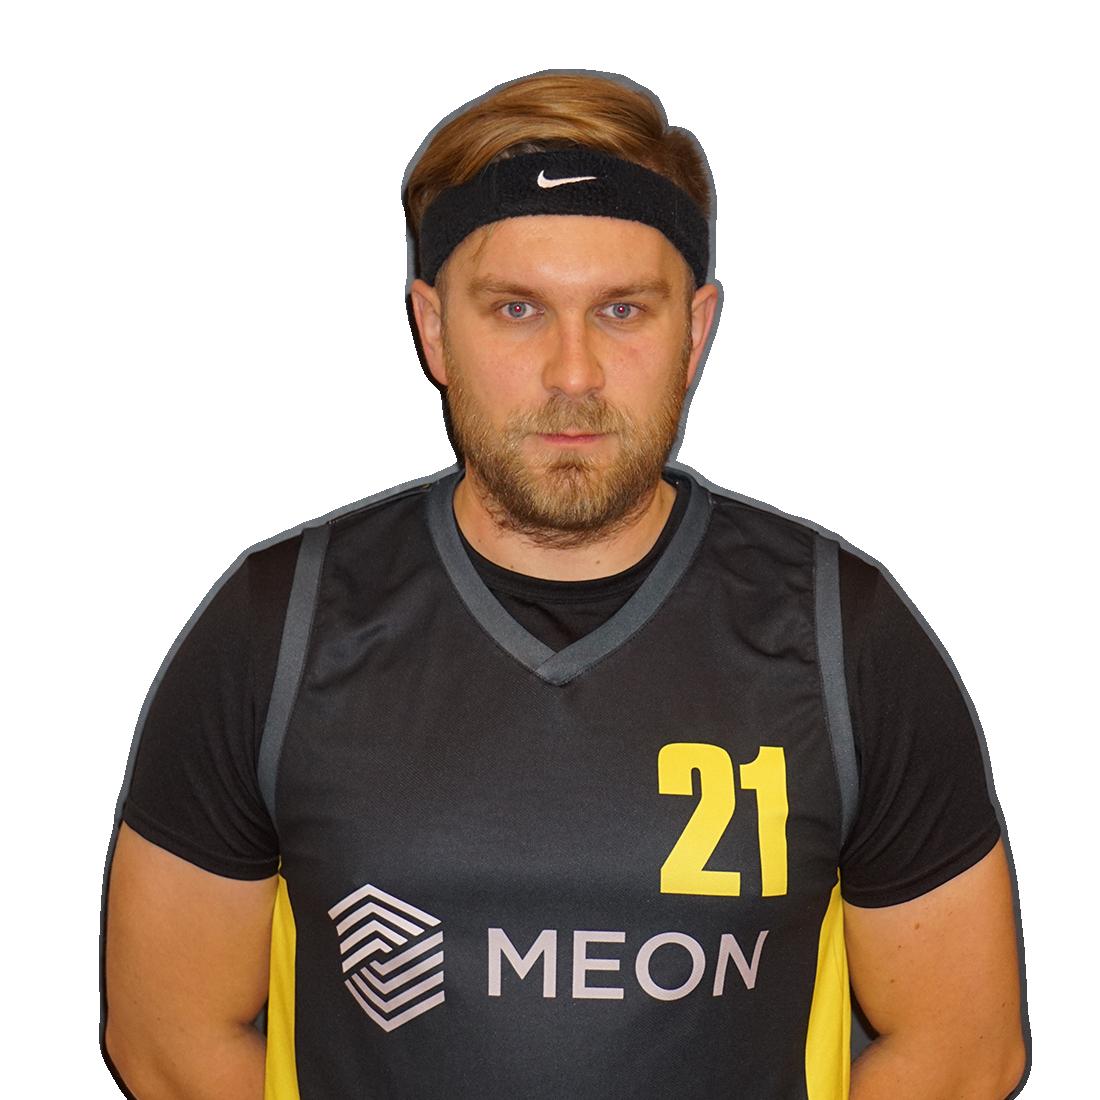 Rafał Surman